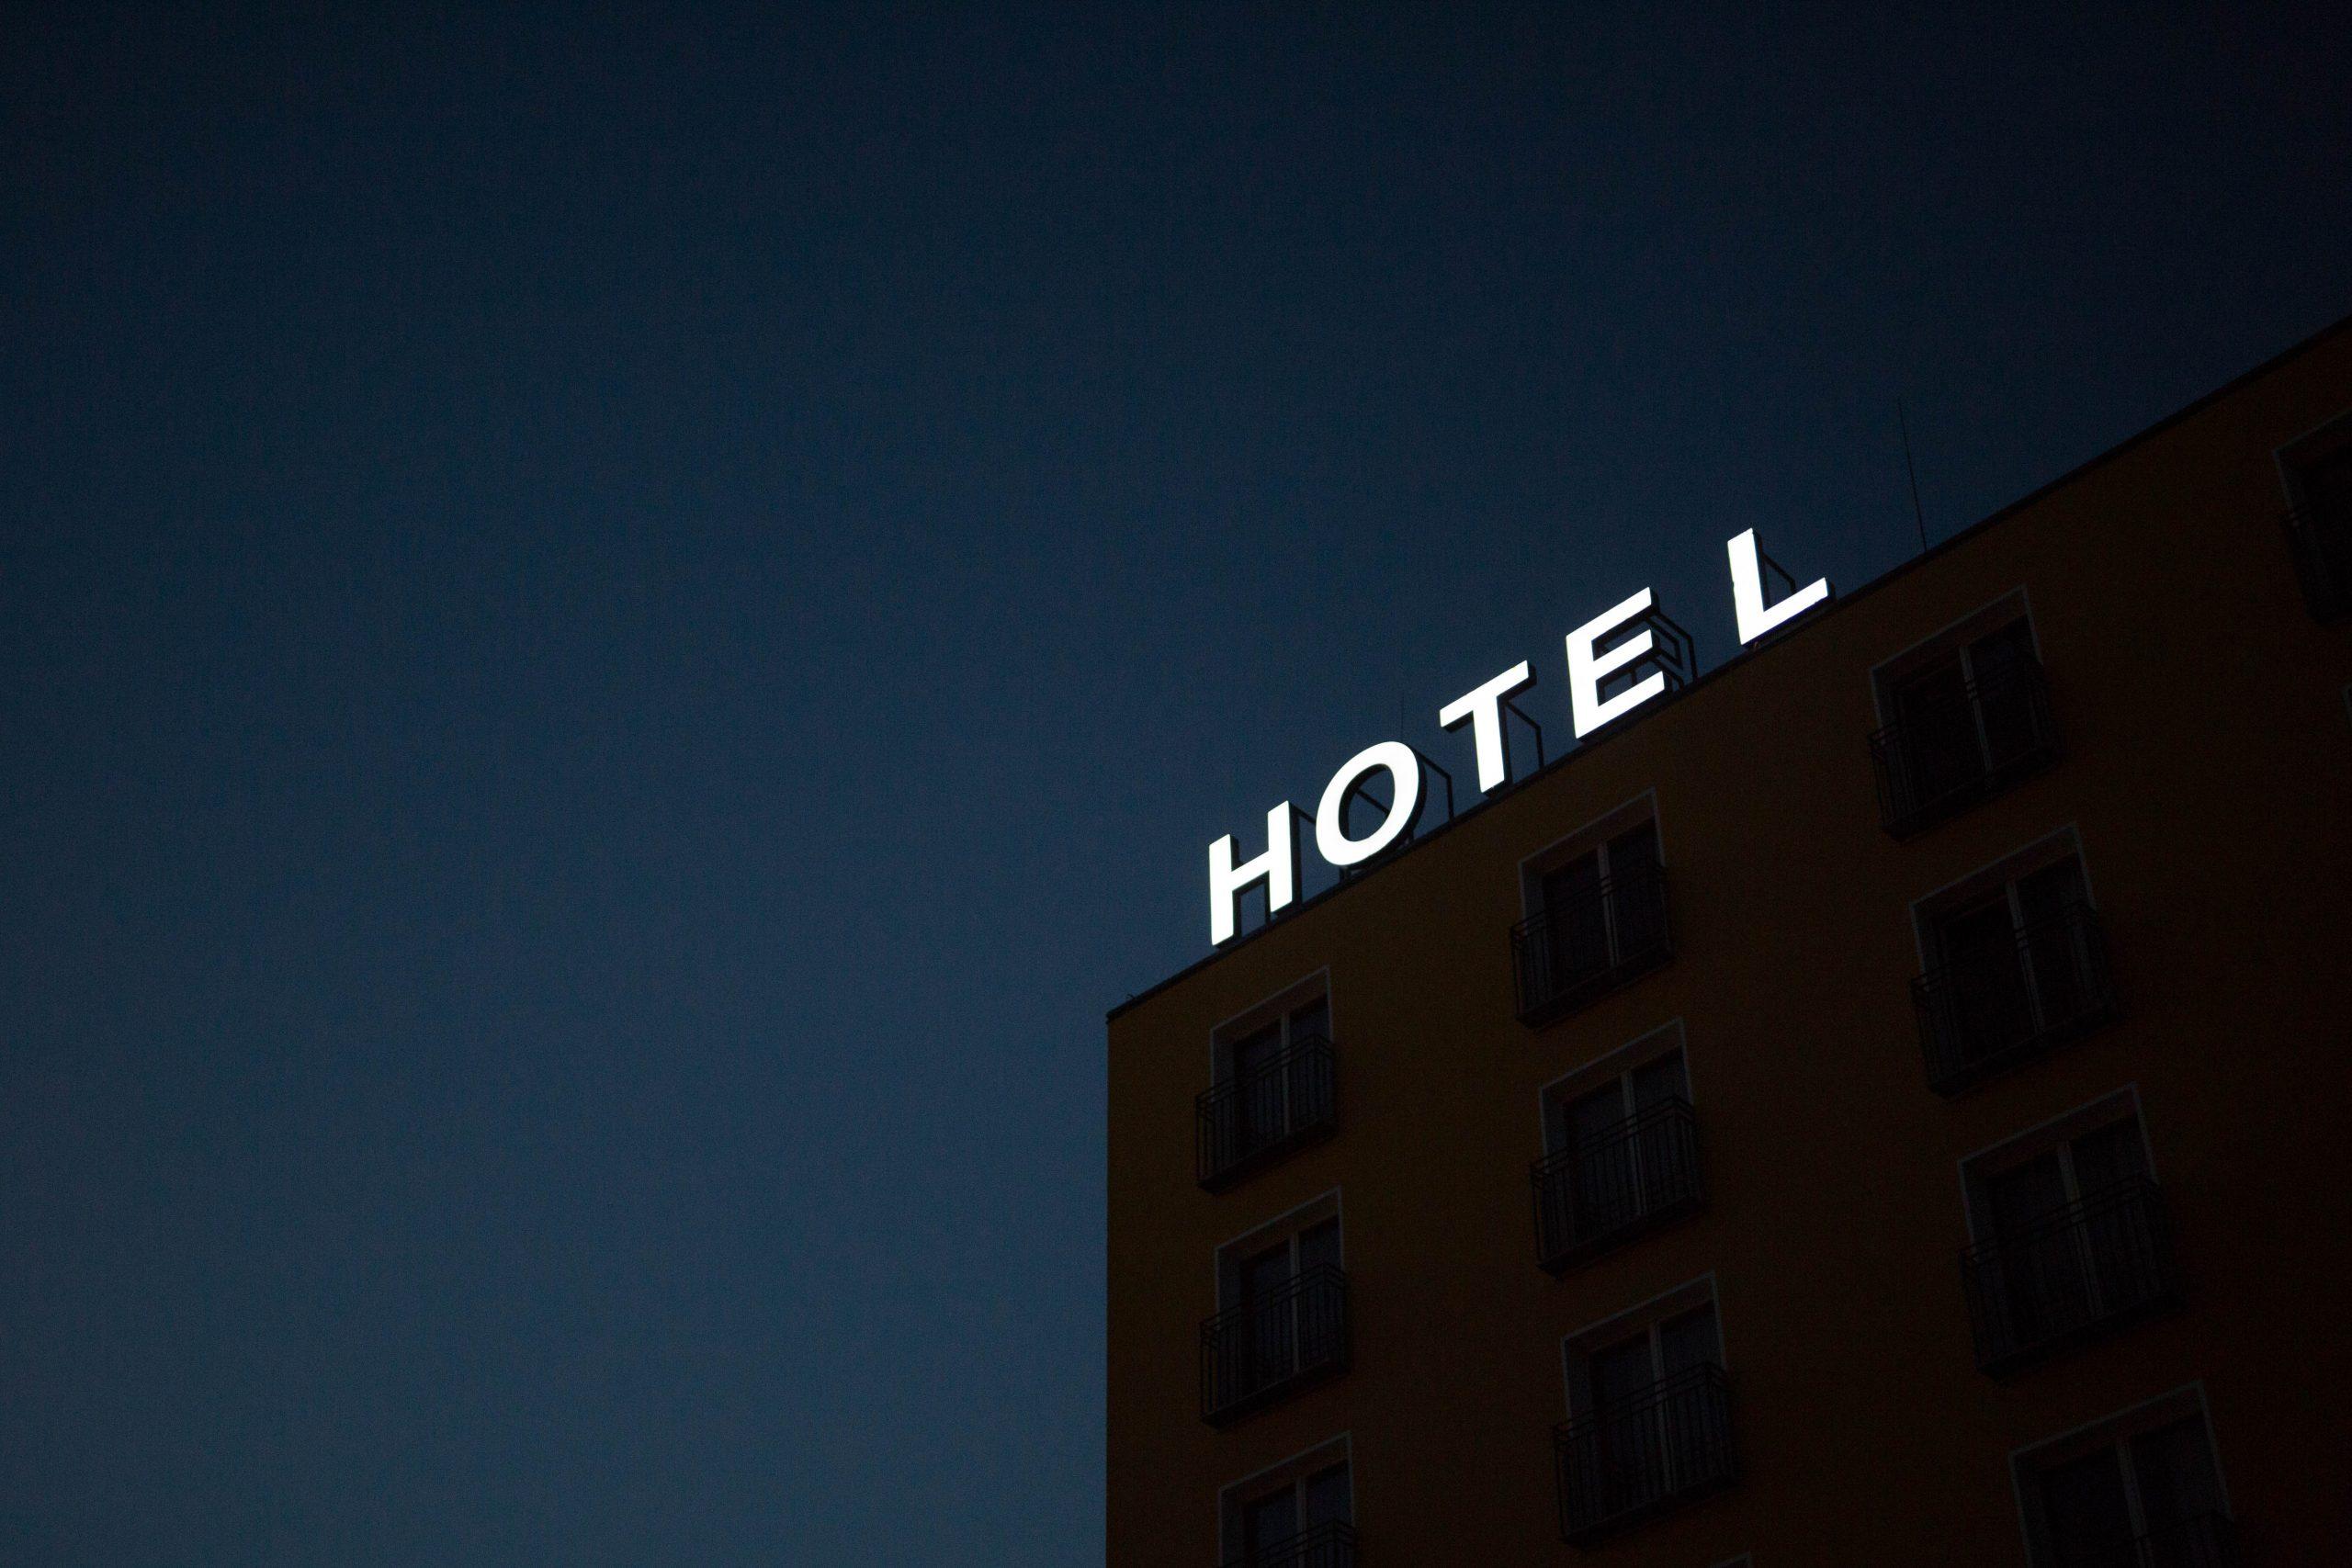 hotel sign image